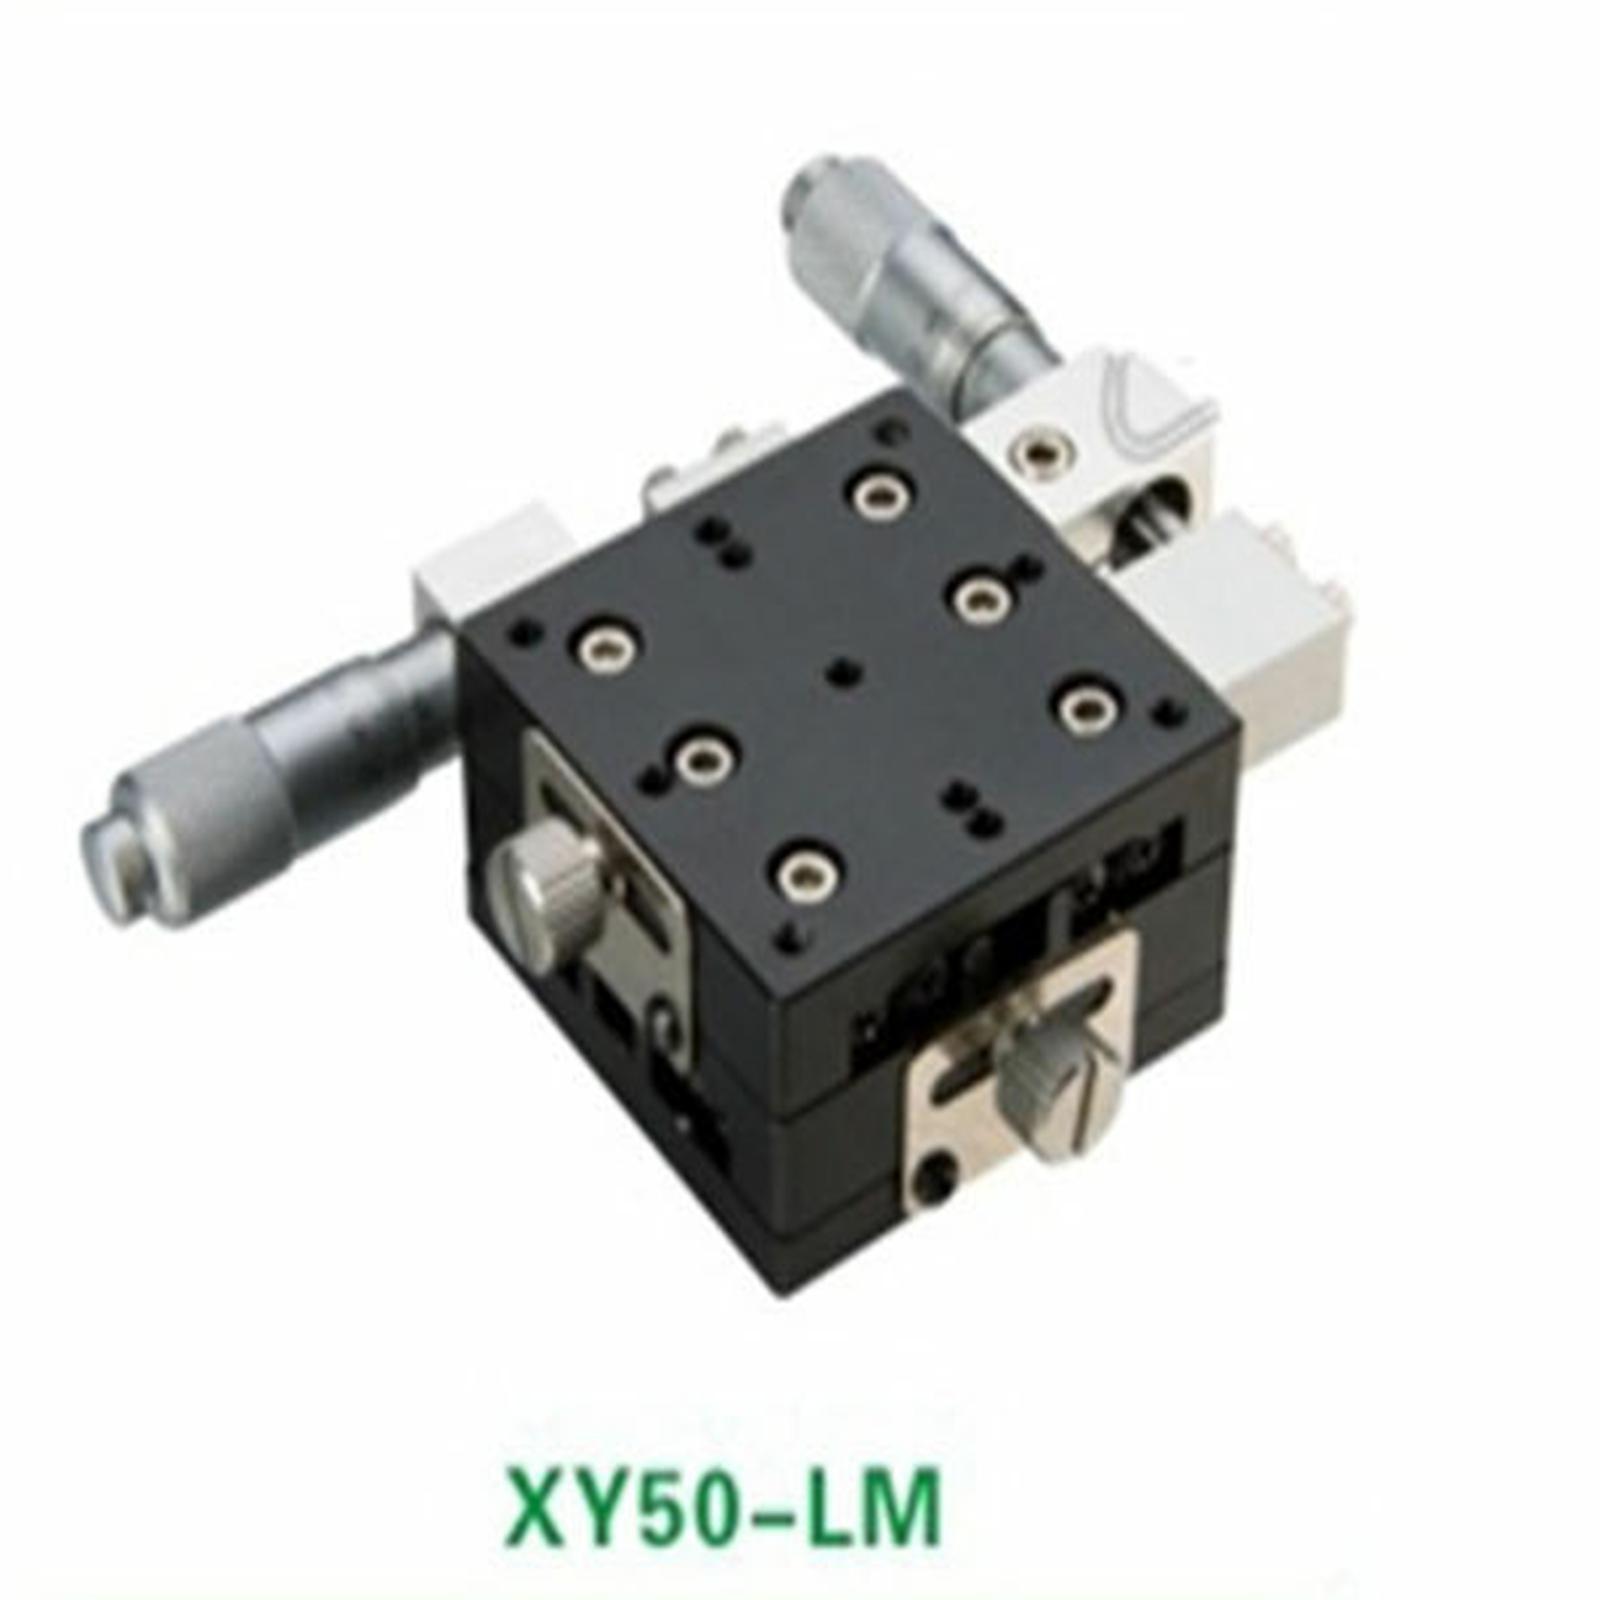 XY Axis 50X50mm Platform Precision Bearing Linear Stage Left MicrometerXY Axis 50X50mm Platform Precision Bearing Linear Stage Left Micrometer